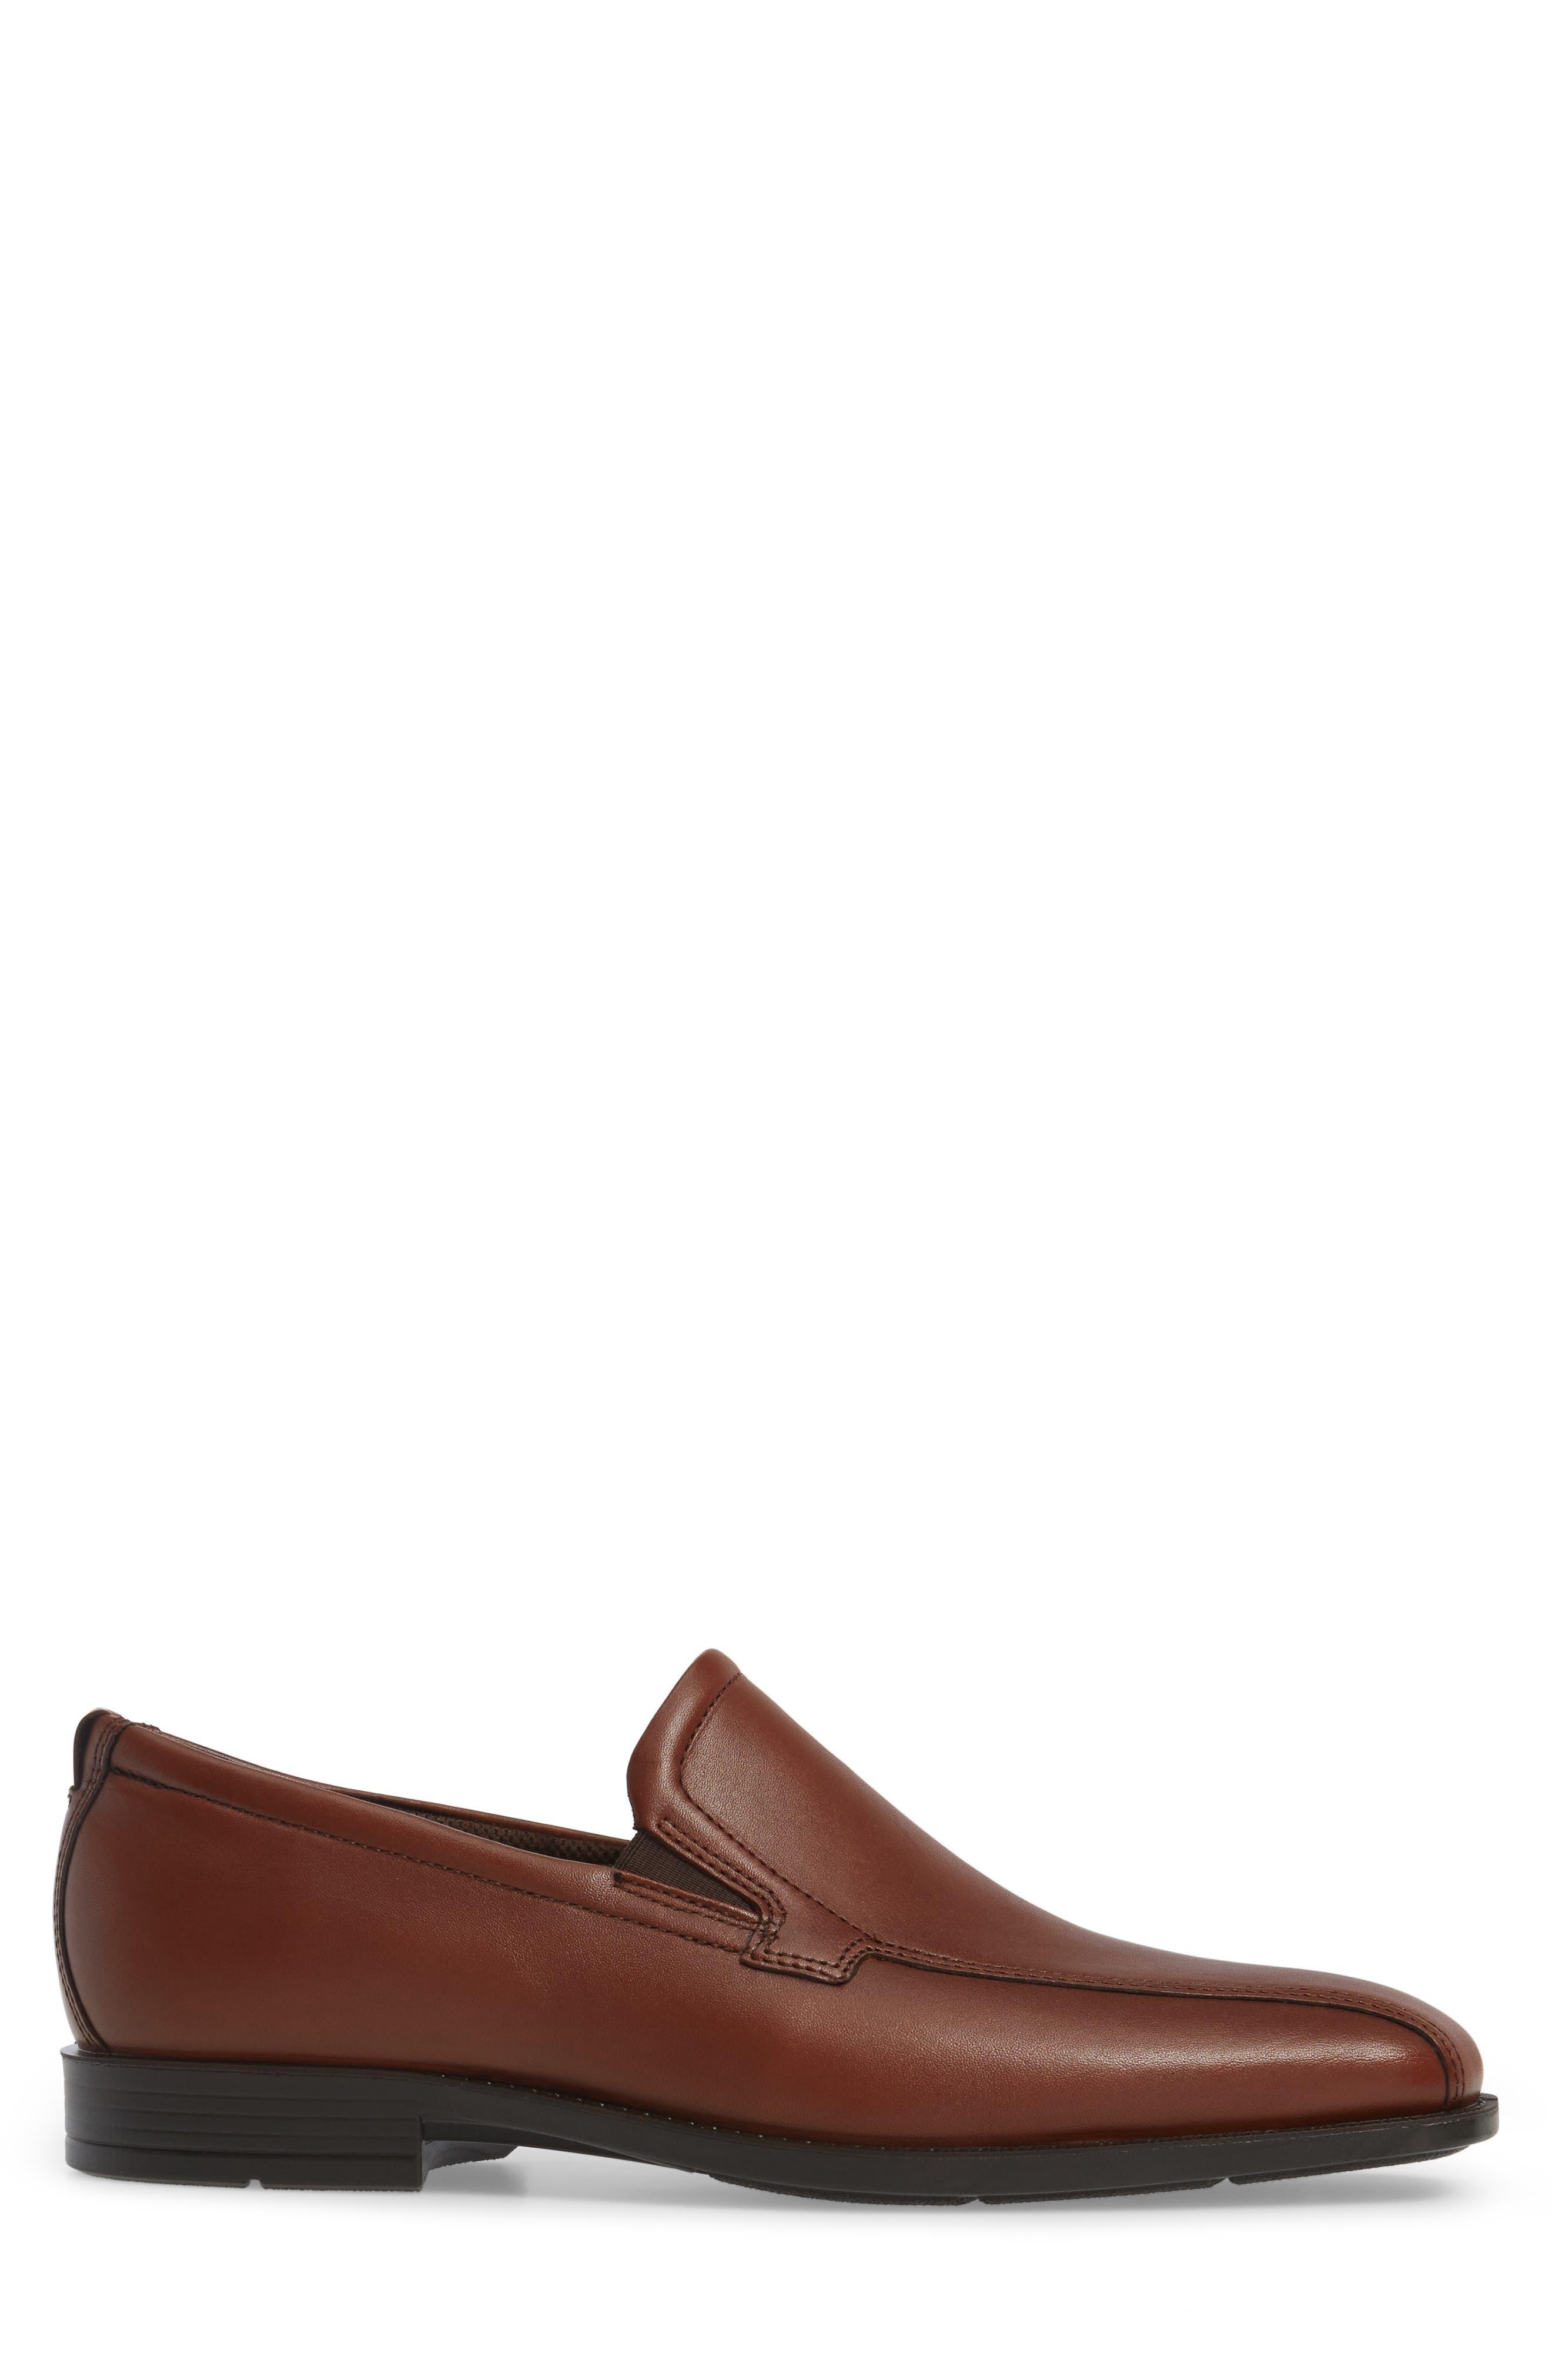 Edinburgh Venetian Loafer,                             Alternate thumbnail 3, color,                             Cognac Leather